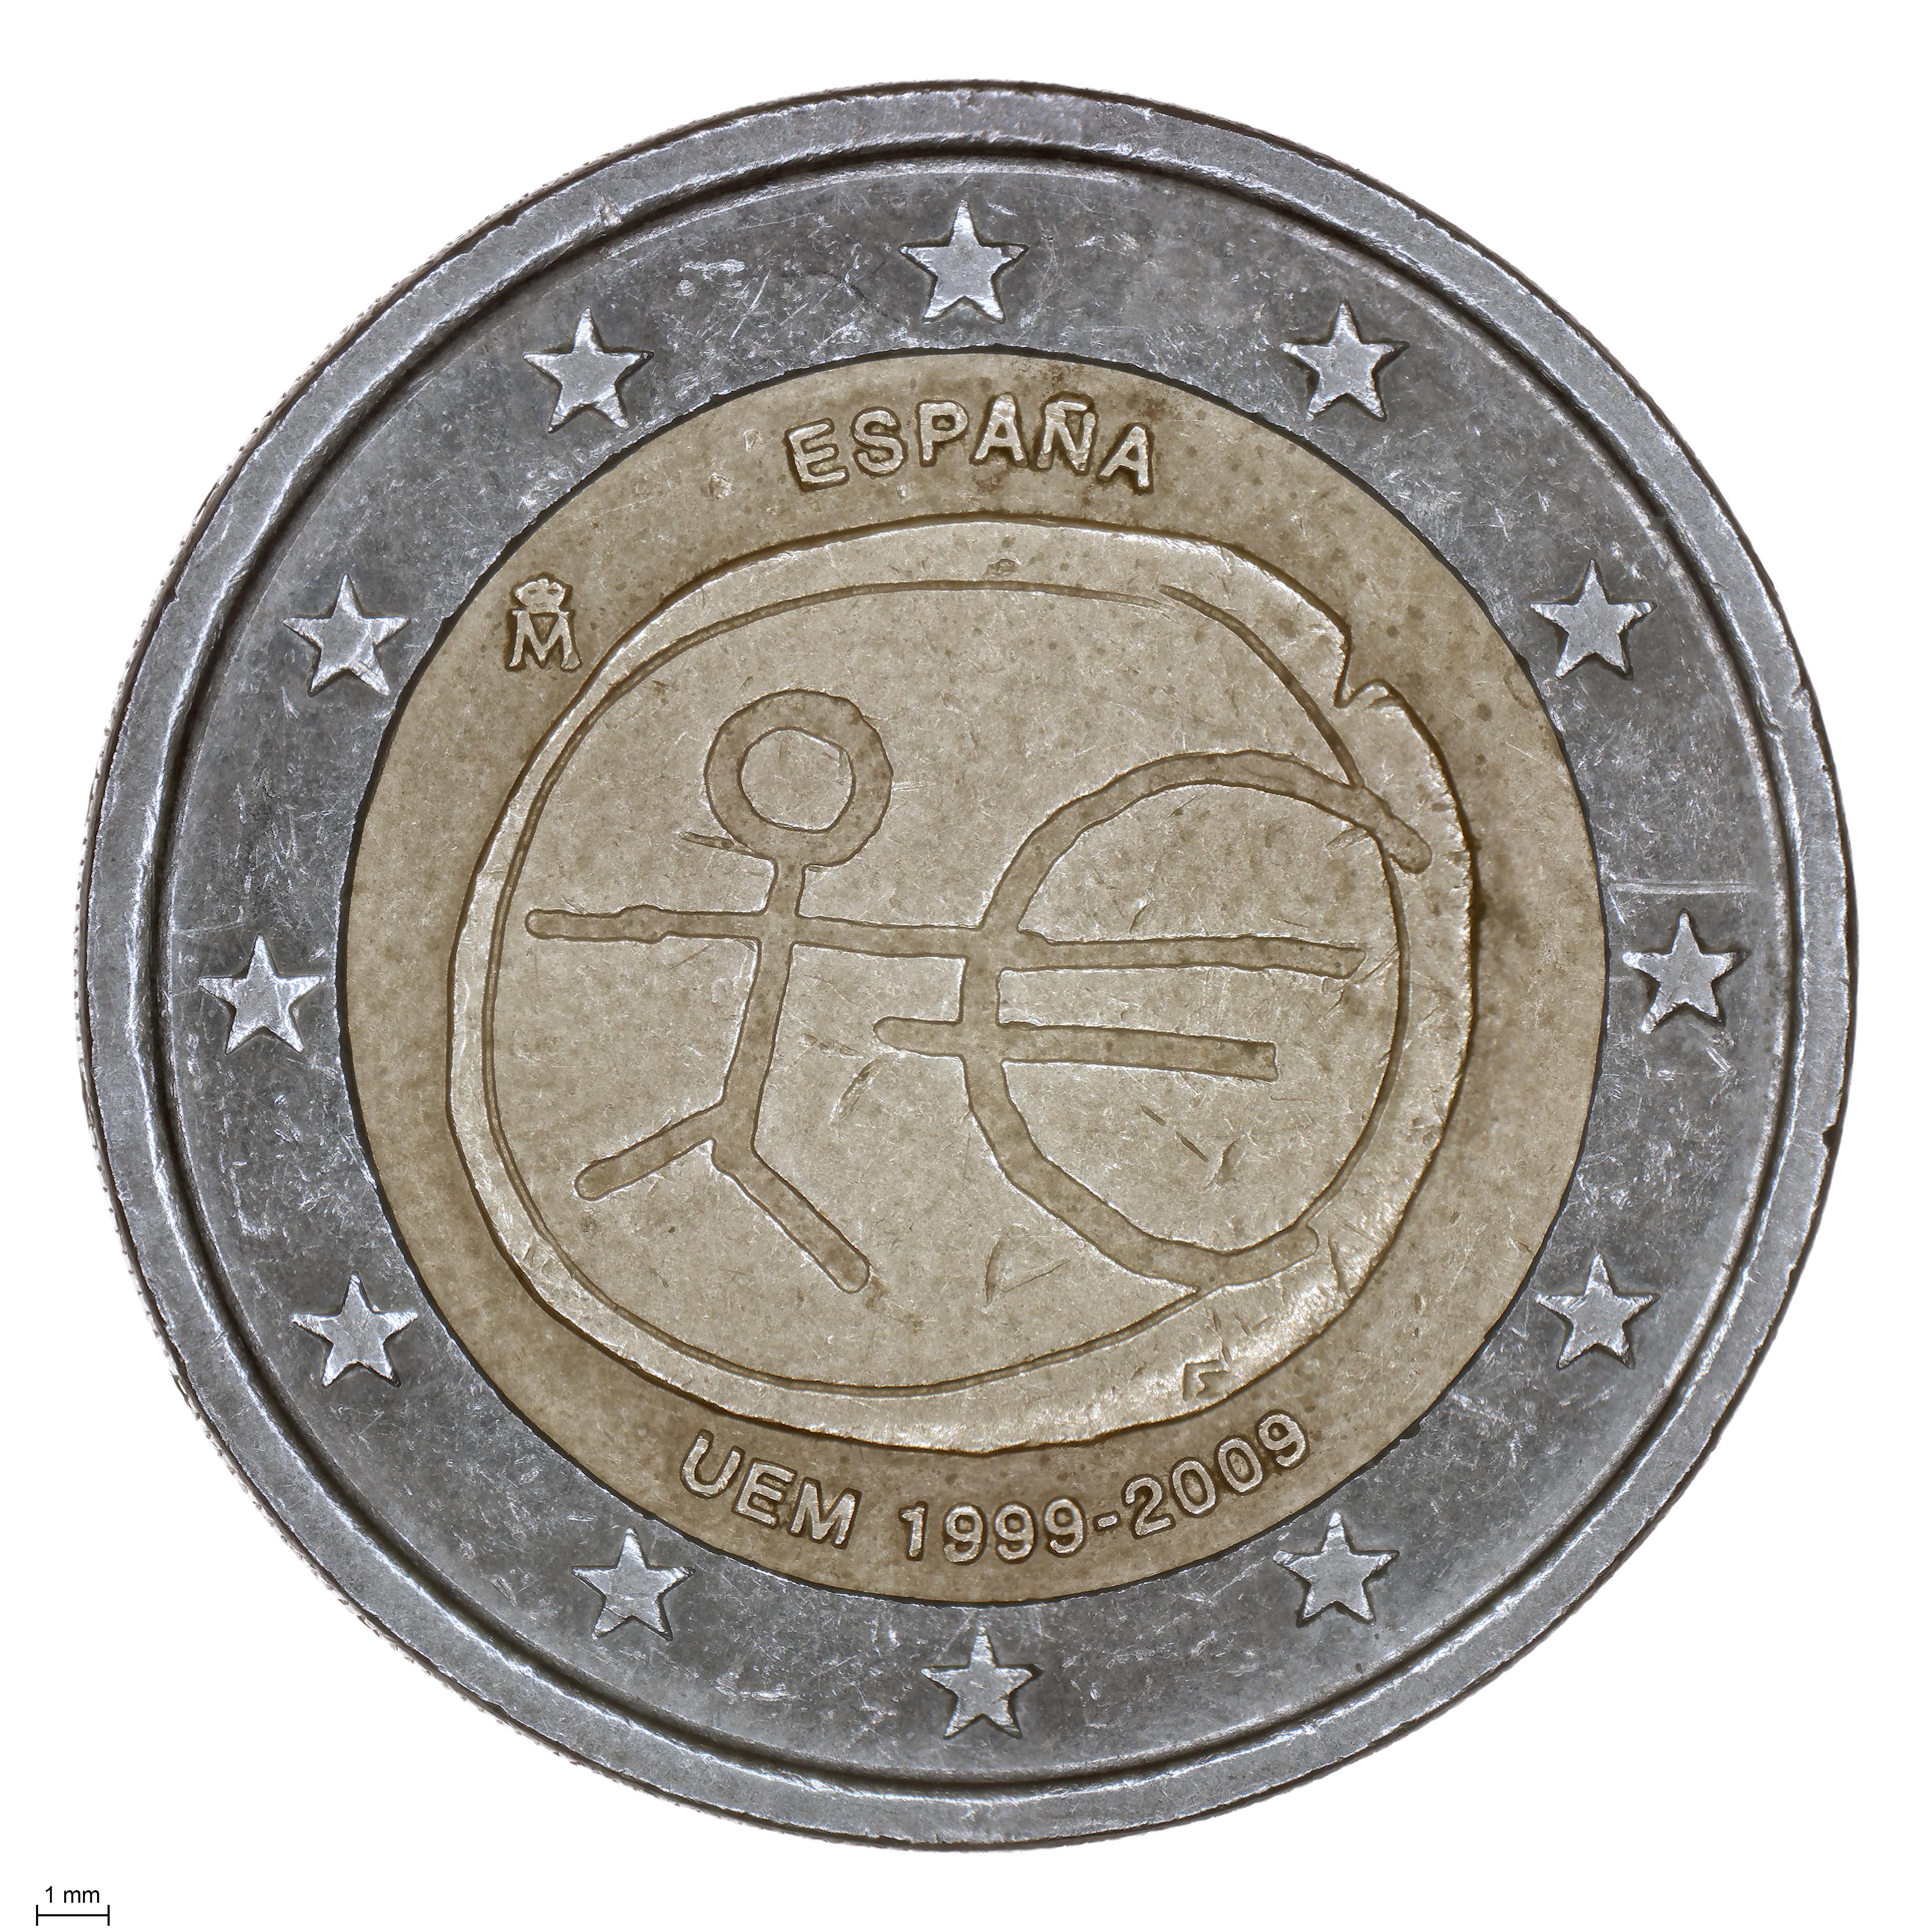 17 09 2014 Des Pieces De 2 Euros Commemoratives